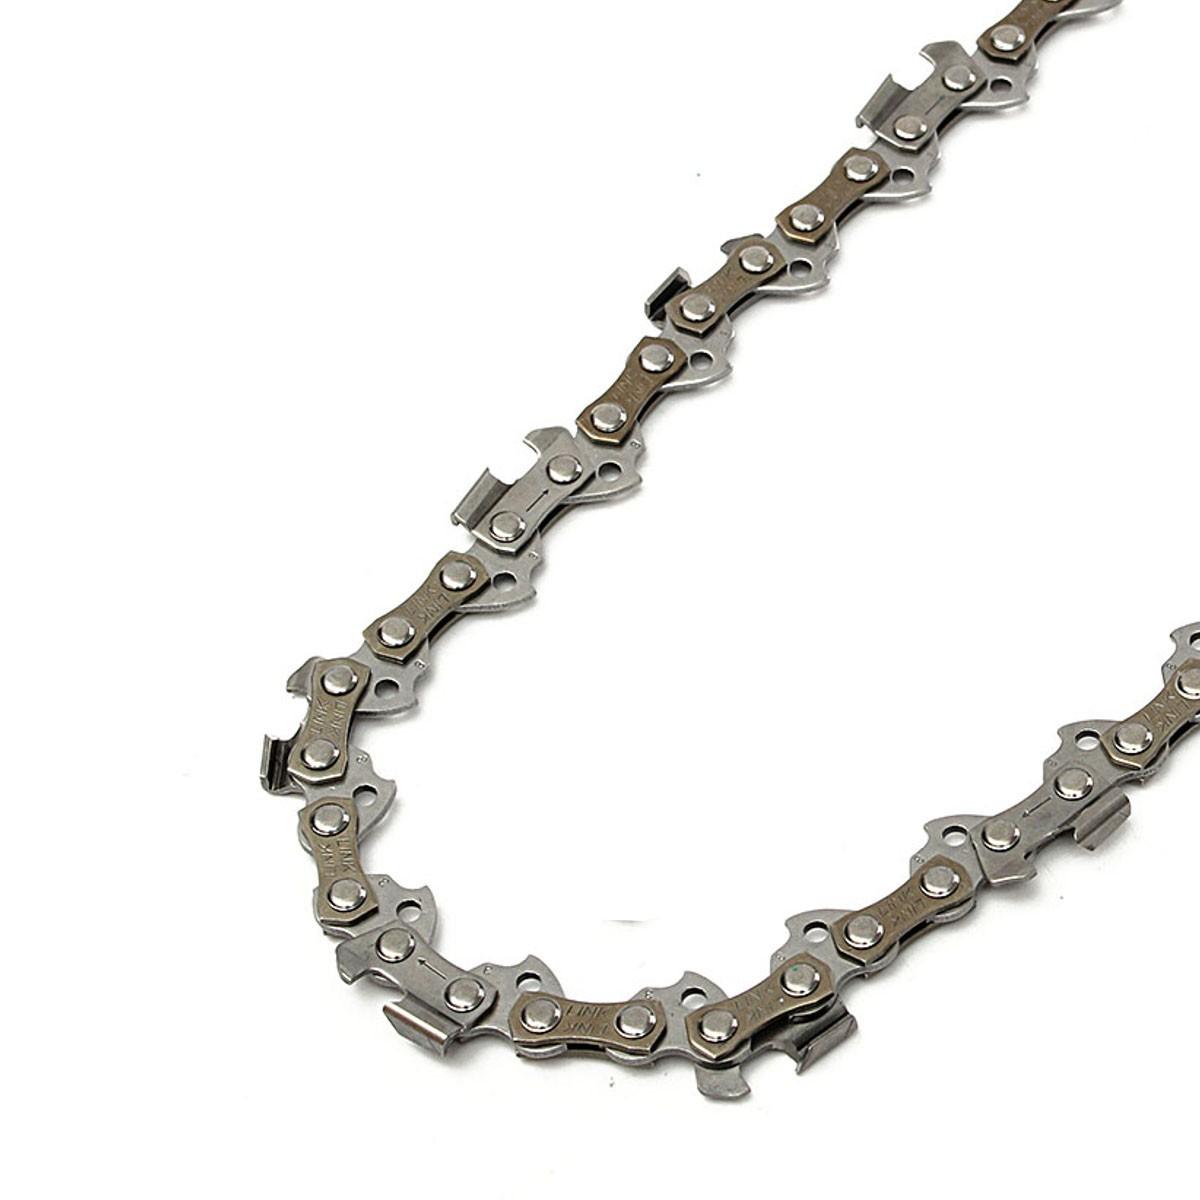 12inch Chain Saw Chain Blade 3/8LP .050 Gauge